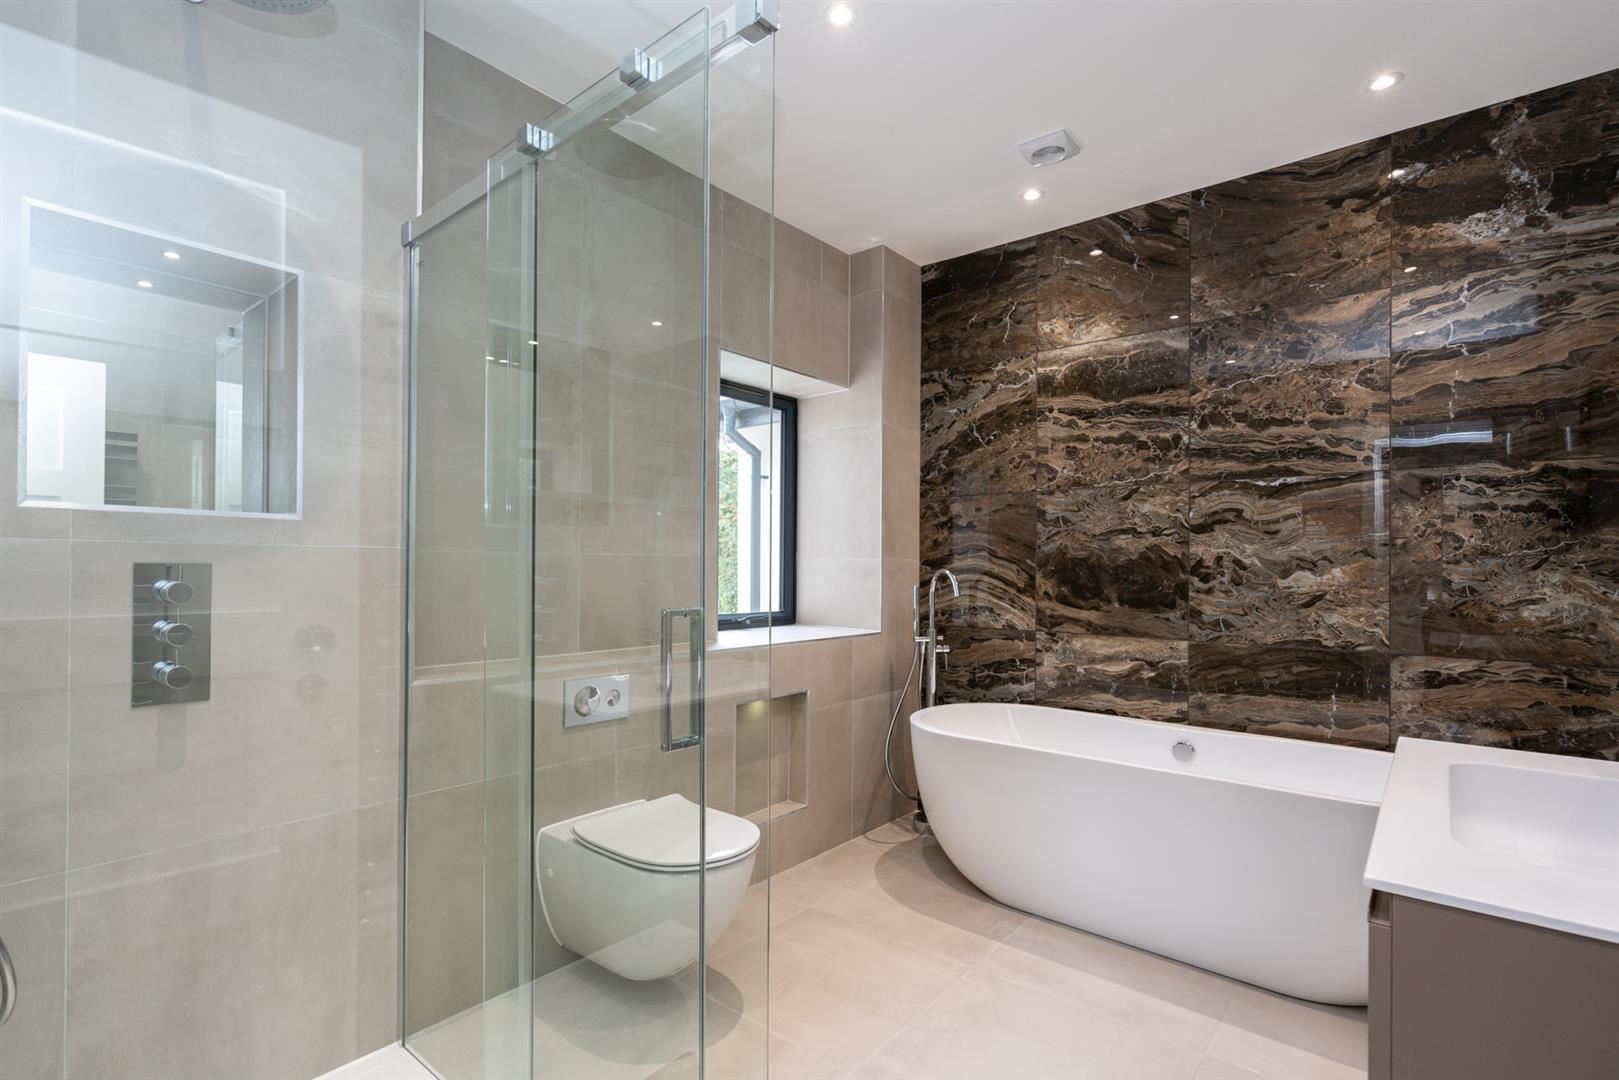 Hillcrest-3183 - bathroom.jpg